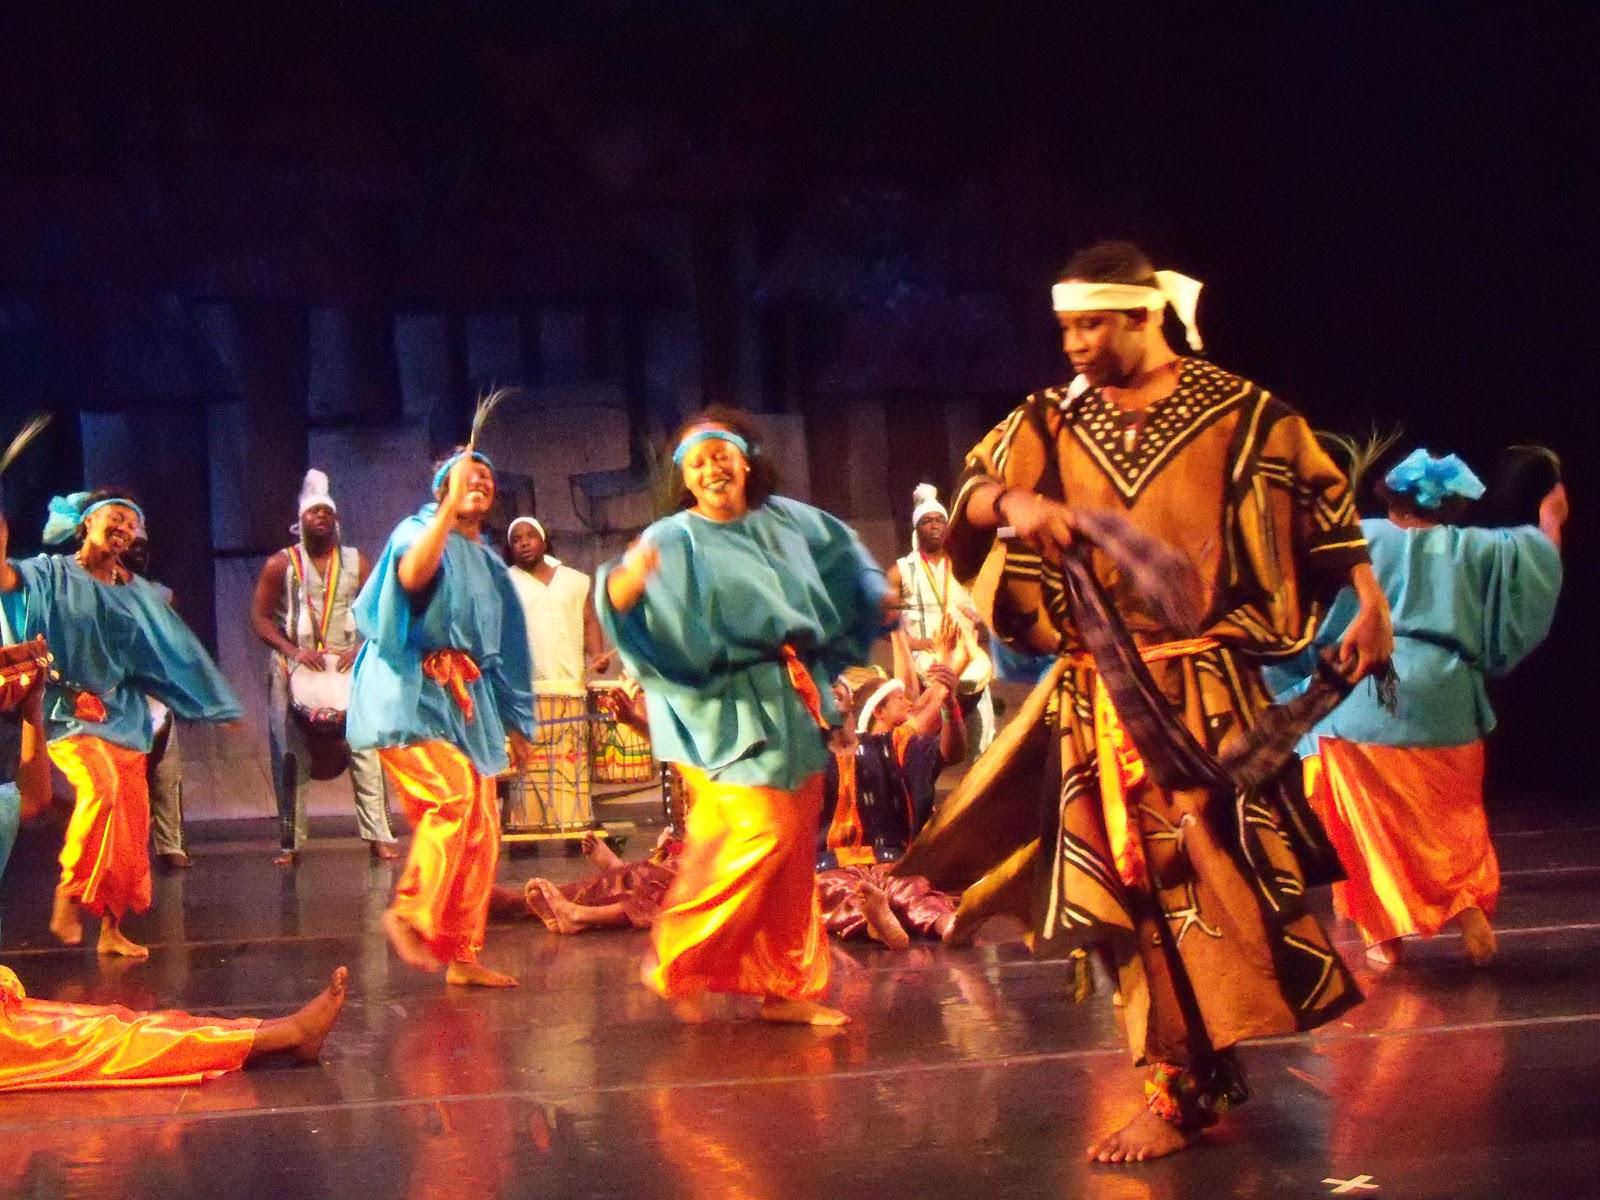 west african dance Amaniyea payne - west african dance amaniyea payne - founder and teaching west african dance lem-lem sophia lemlem walsh.